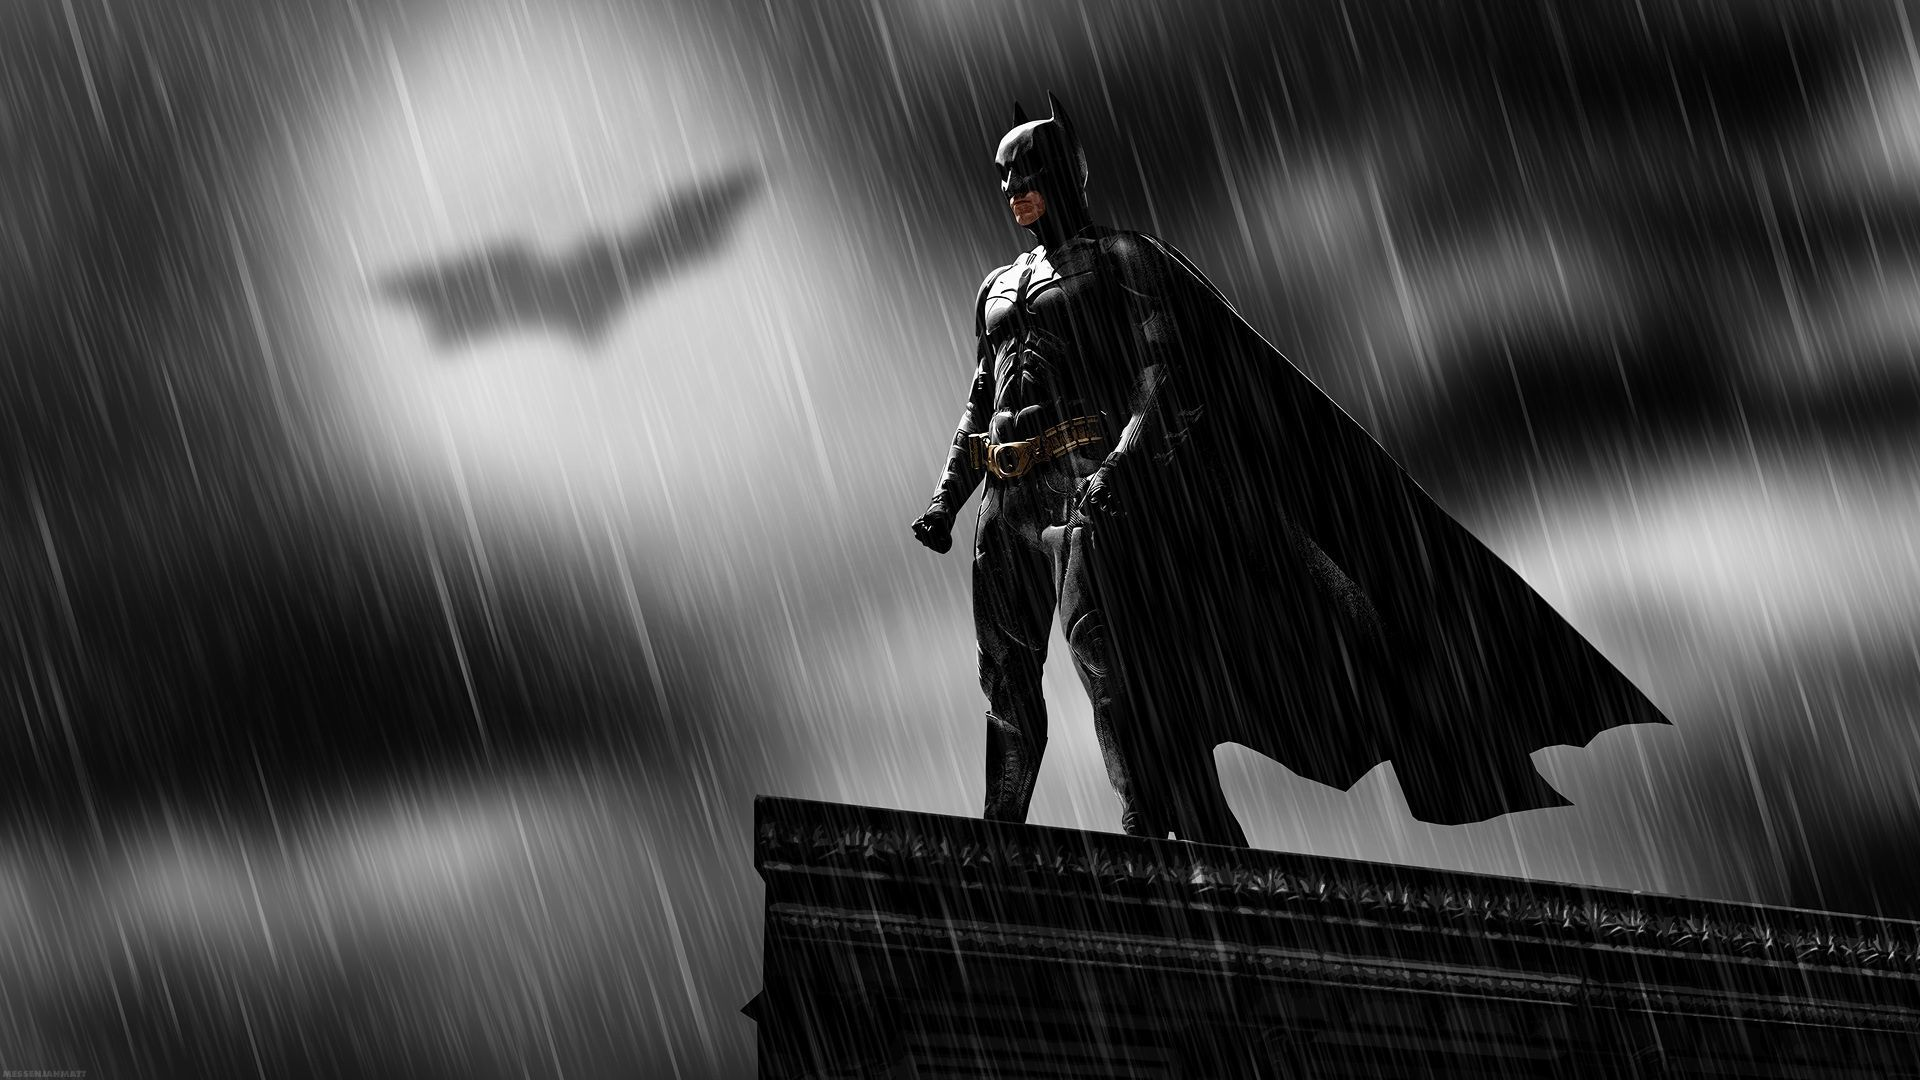 31+] Batman Movie PC HD Wallpapers on